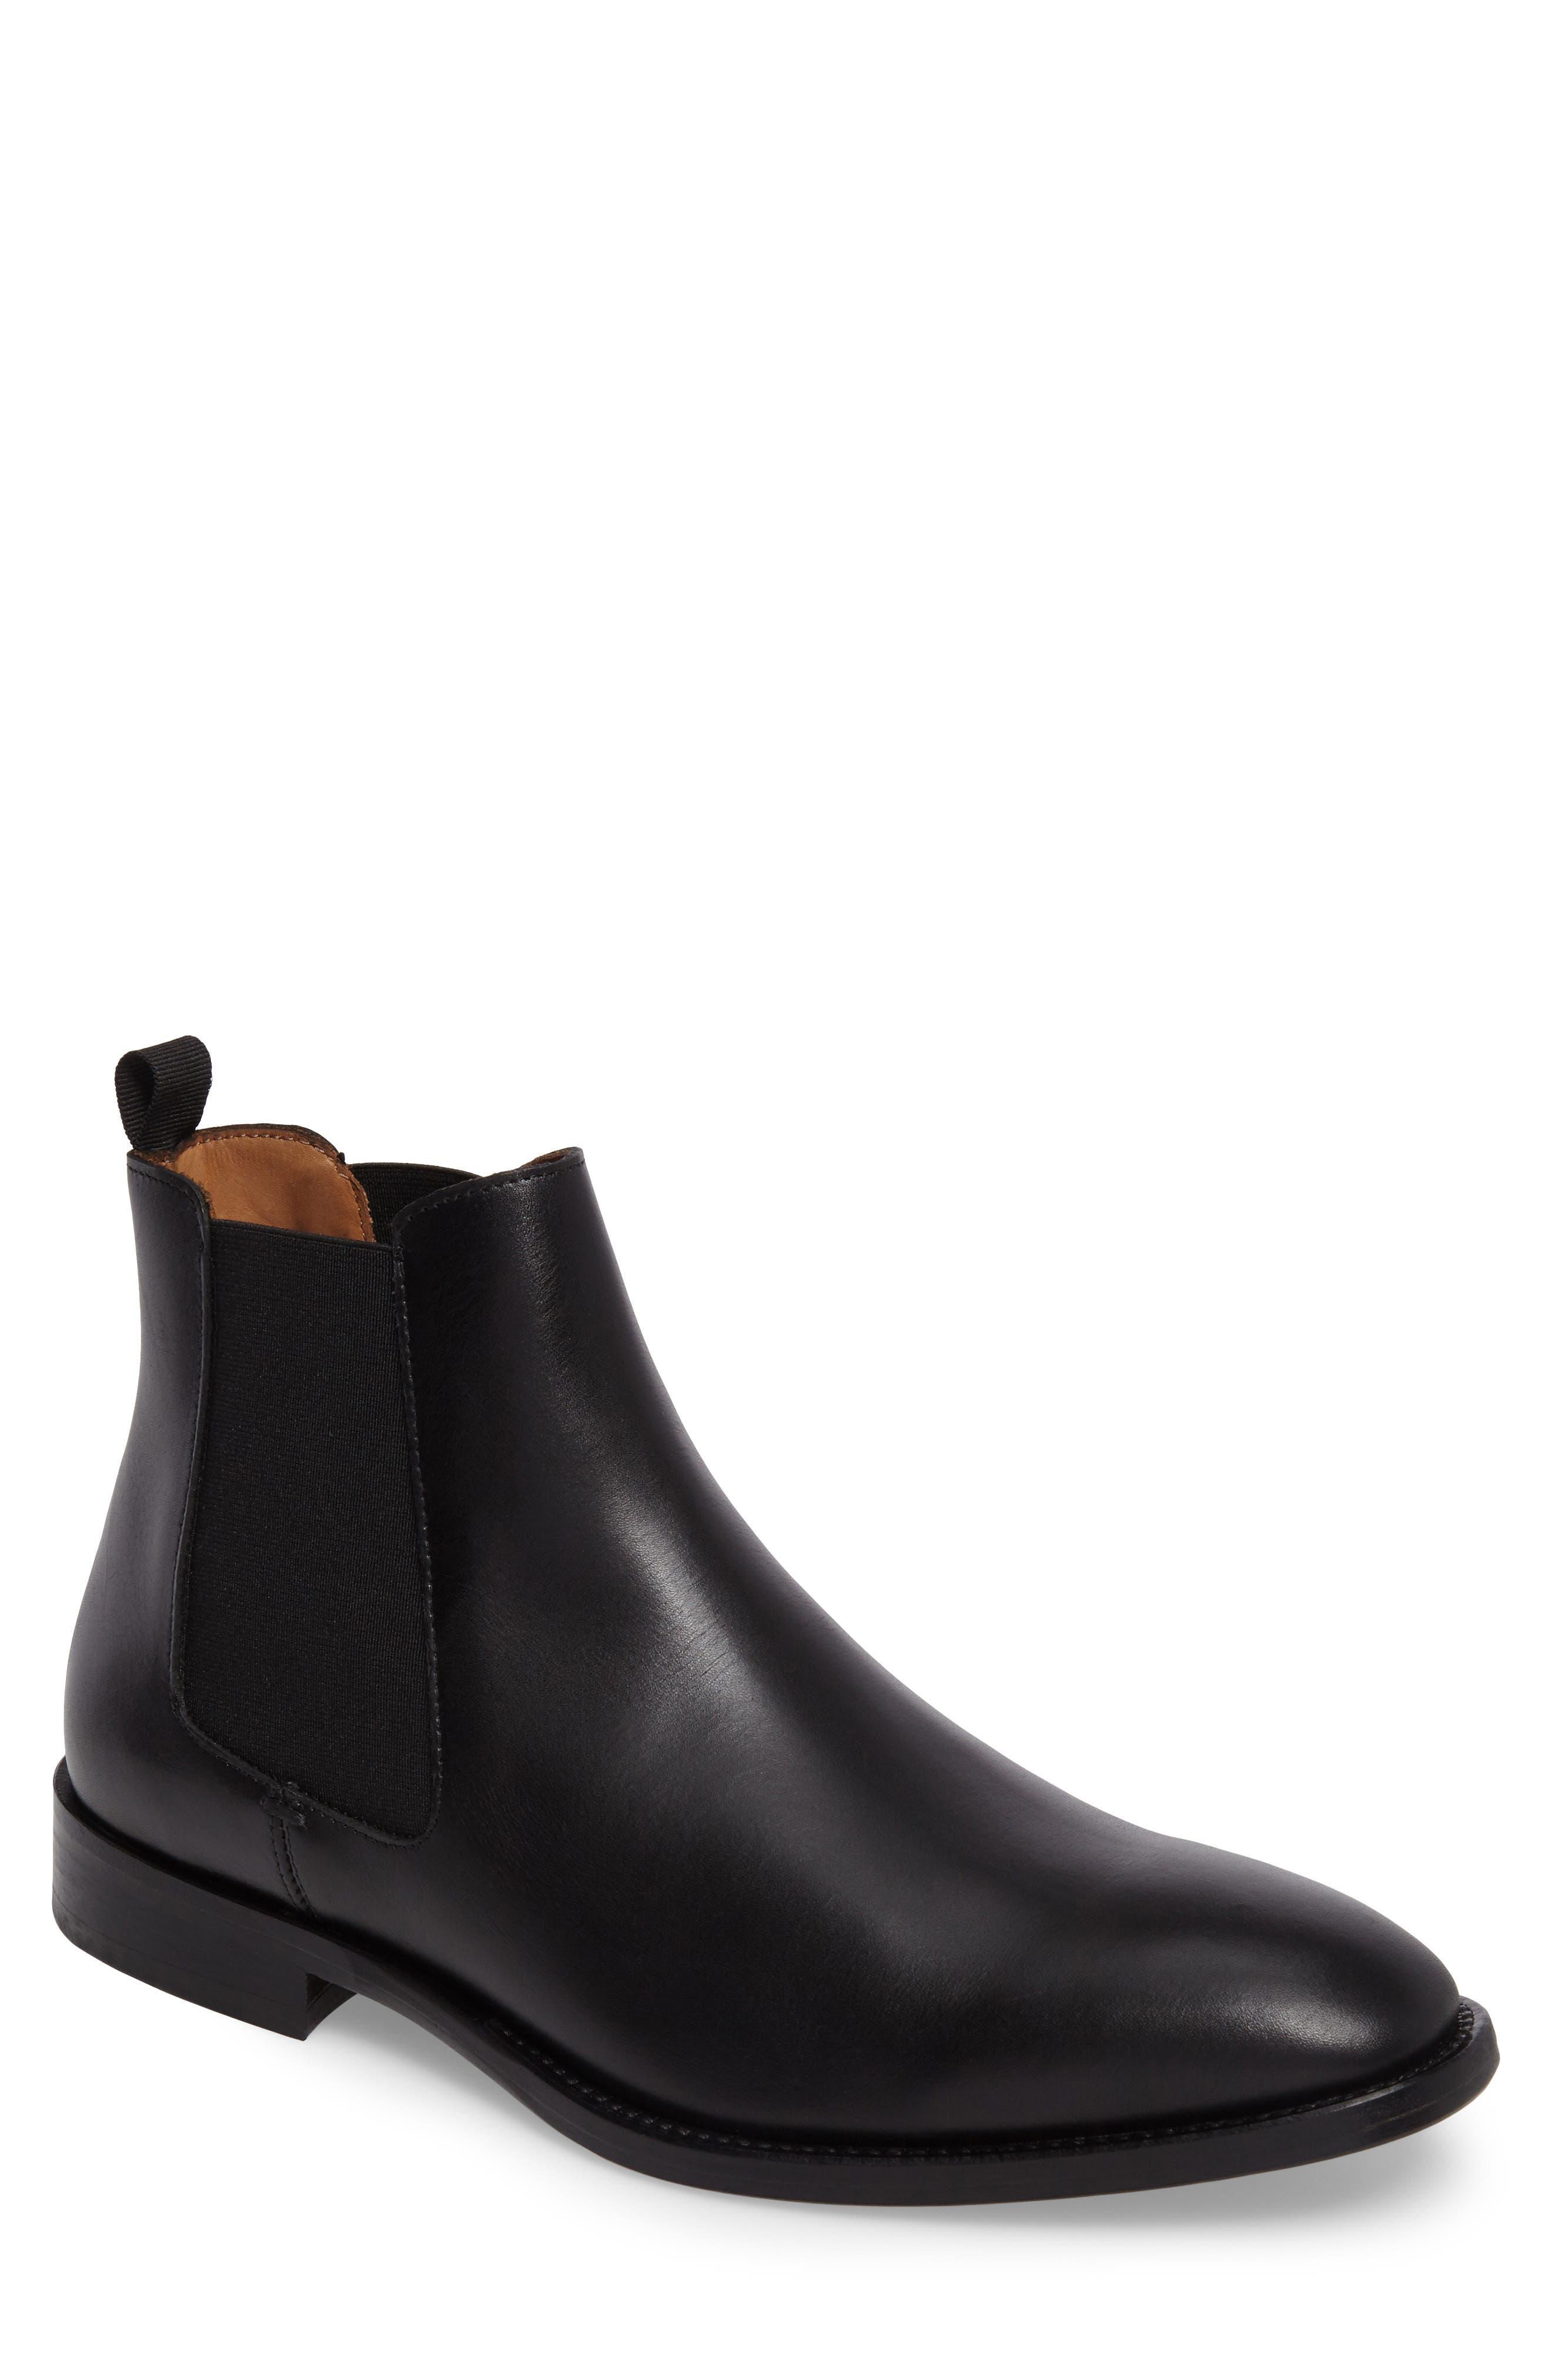 Haldien Chelsea Boot,                         Main,                         color, Black Leather/ Elastic